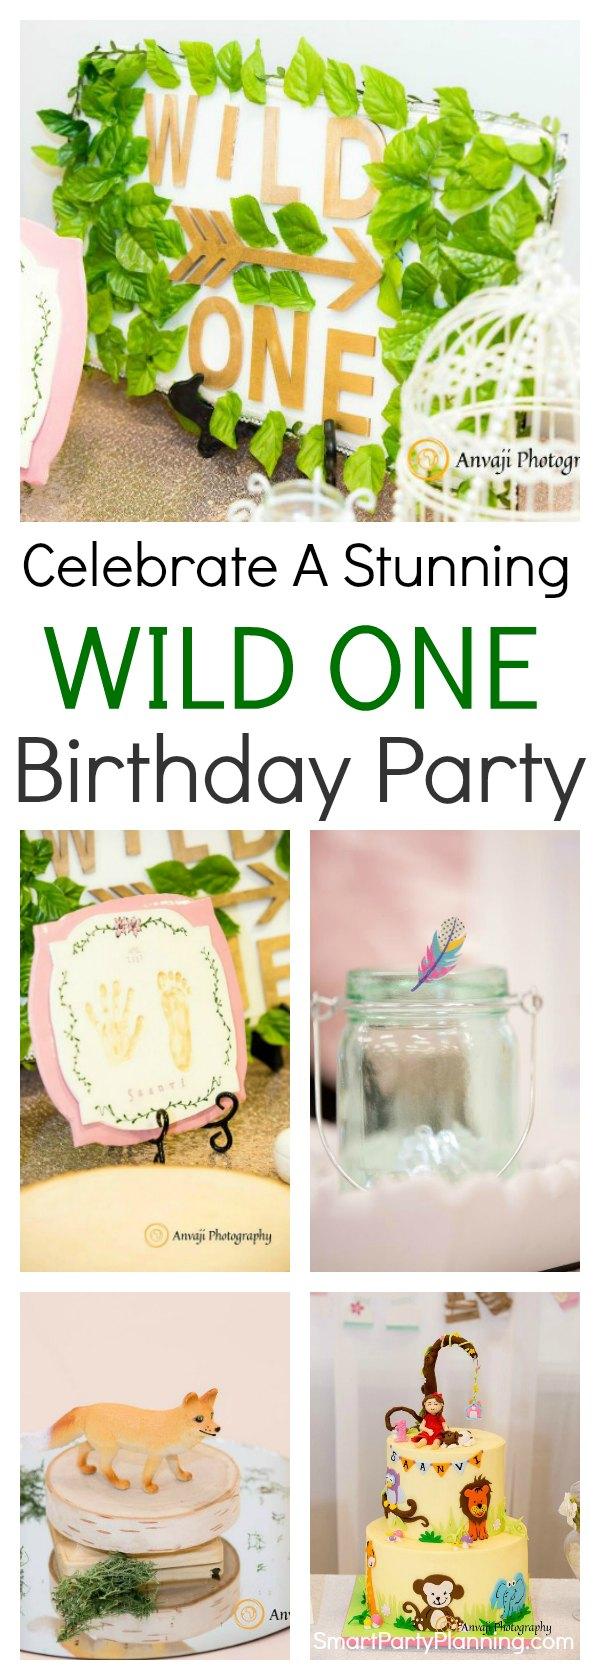 Celebrate a stunning wild one birthday party